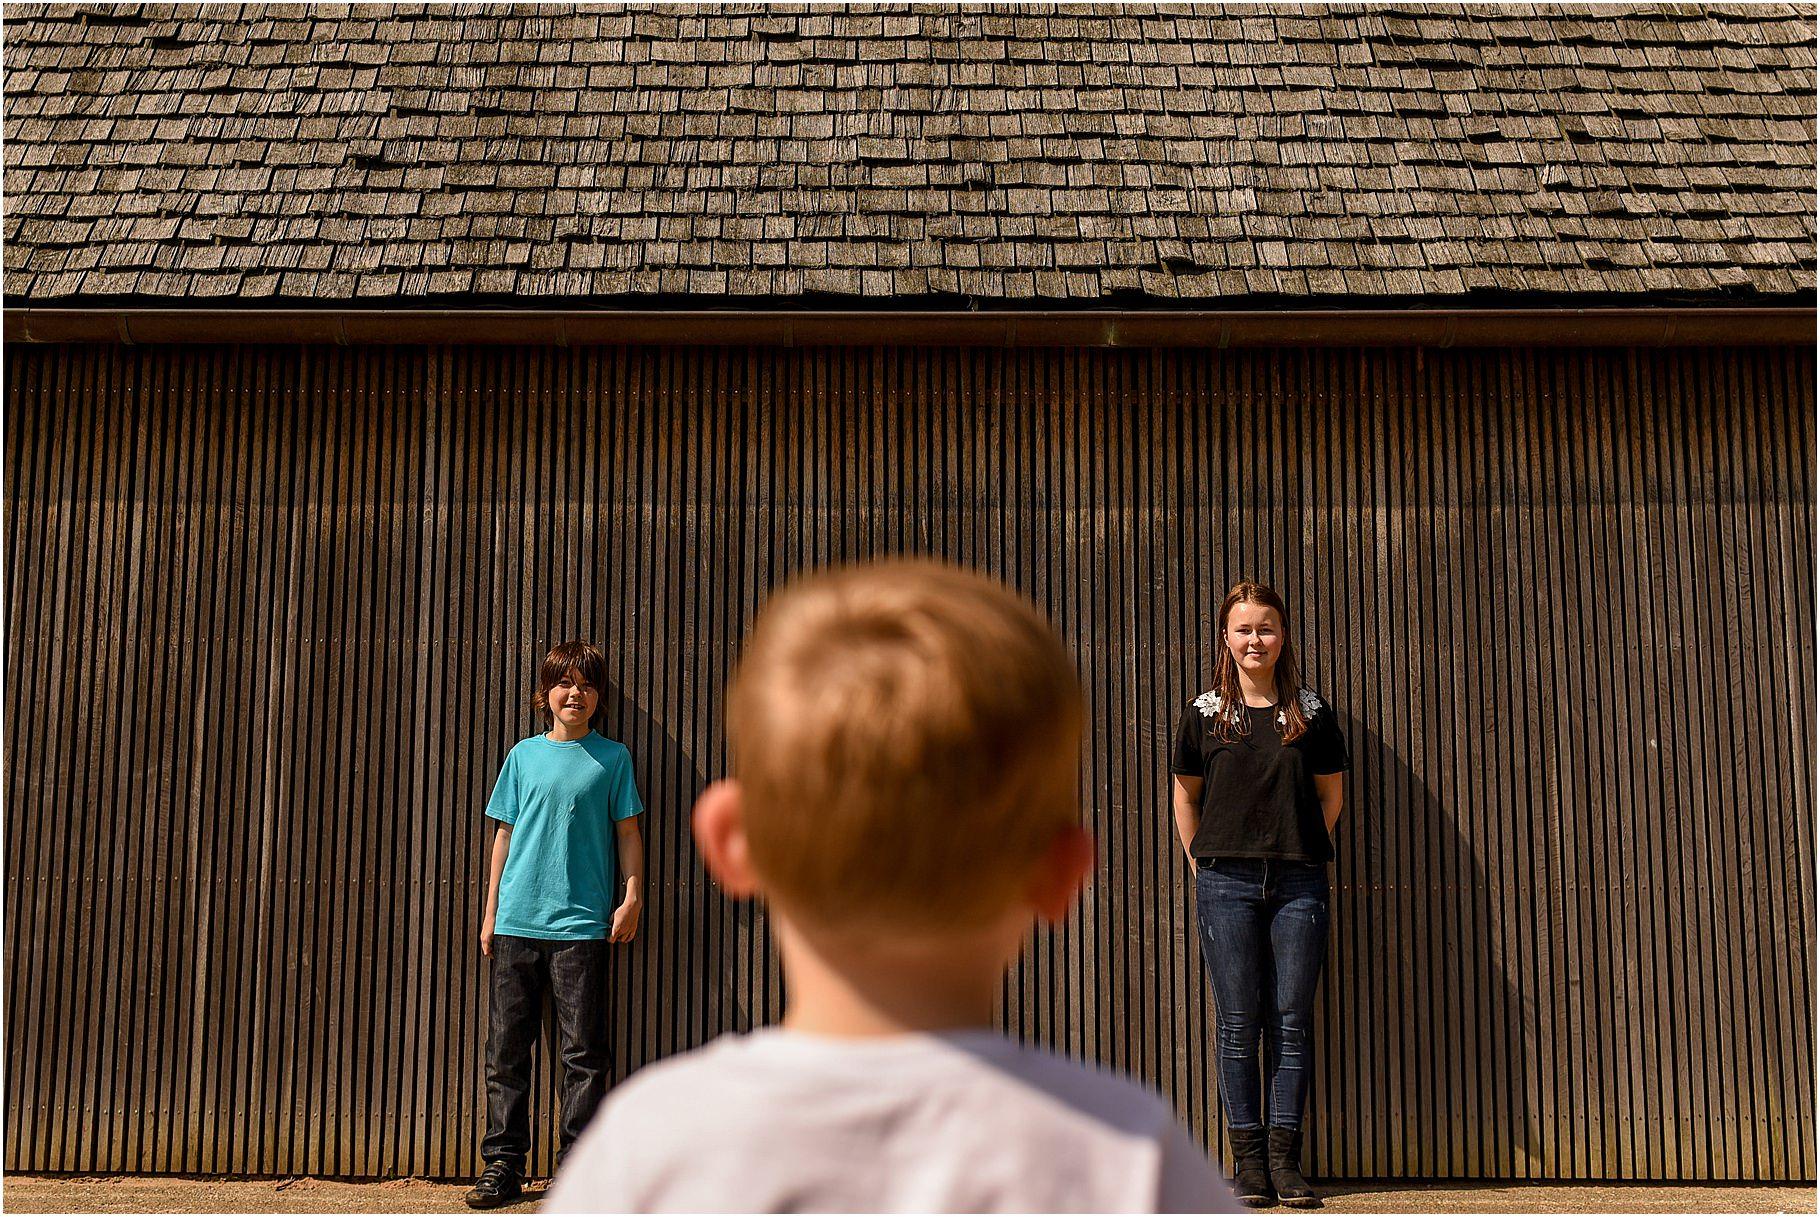 preston-family-shoot-brockholes-29.jpg